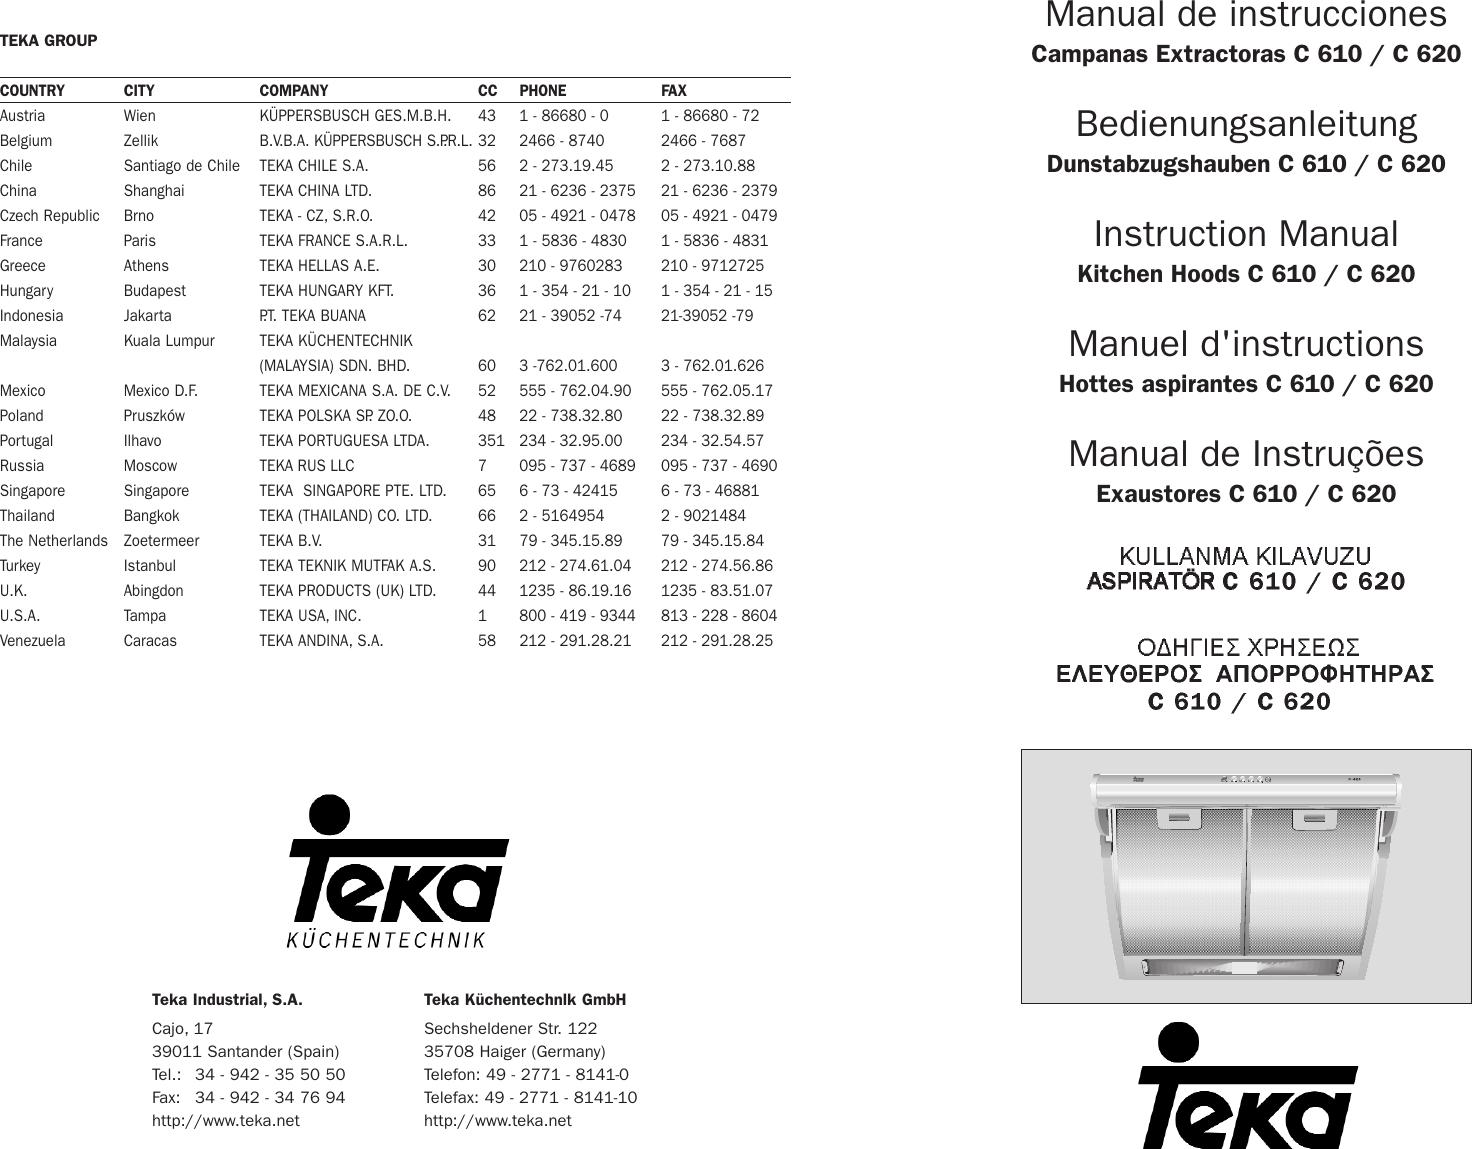 Teka Kitchen Hoods C 610 Users Manual 1 C610 C620 E Niceic Type Wiring Codes